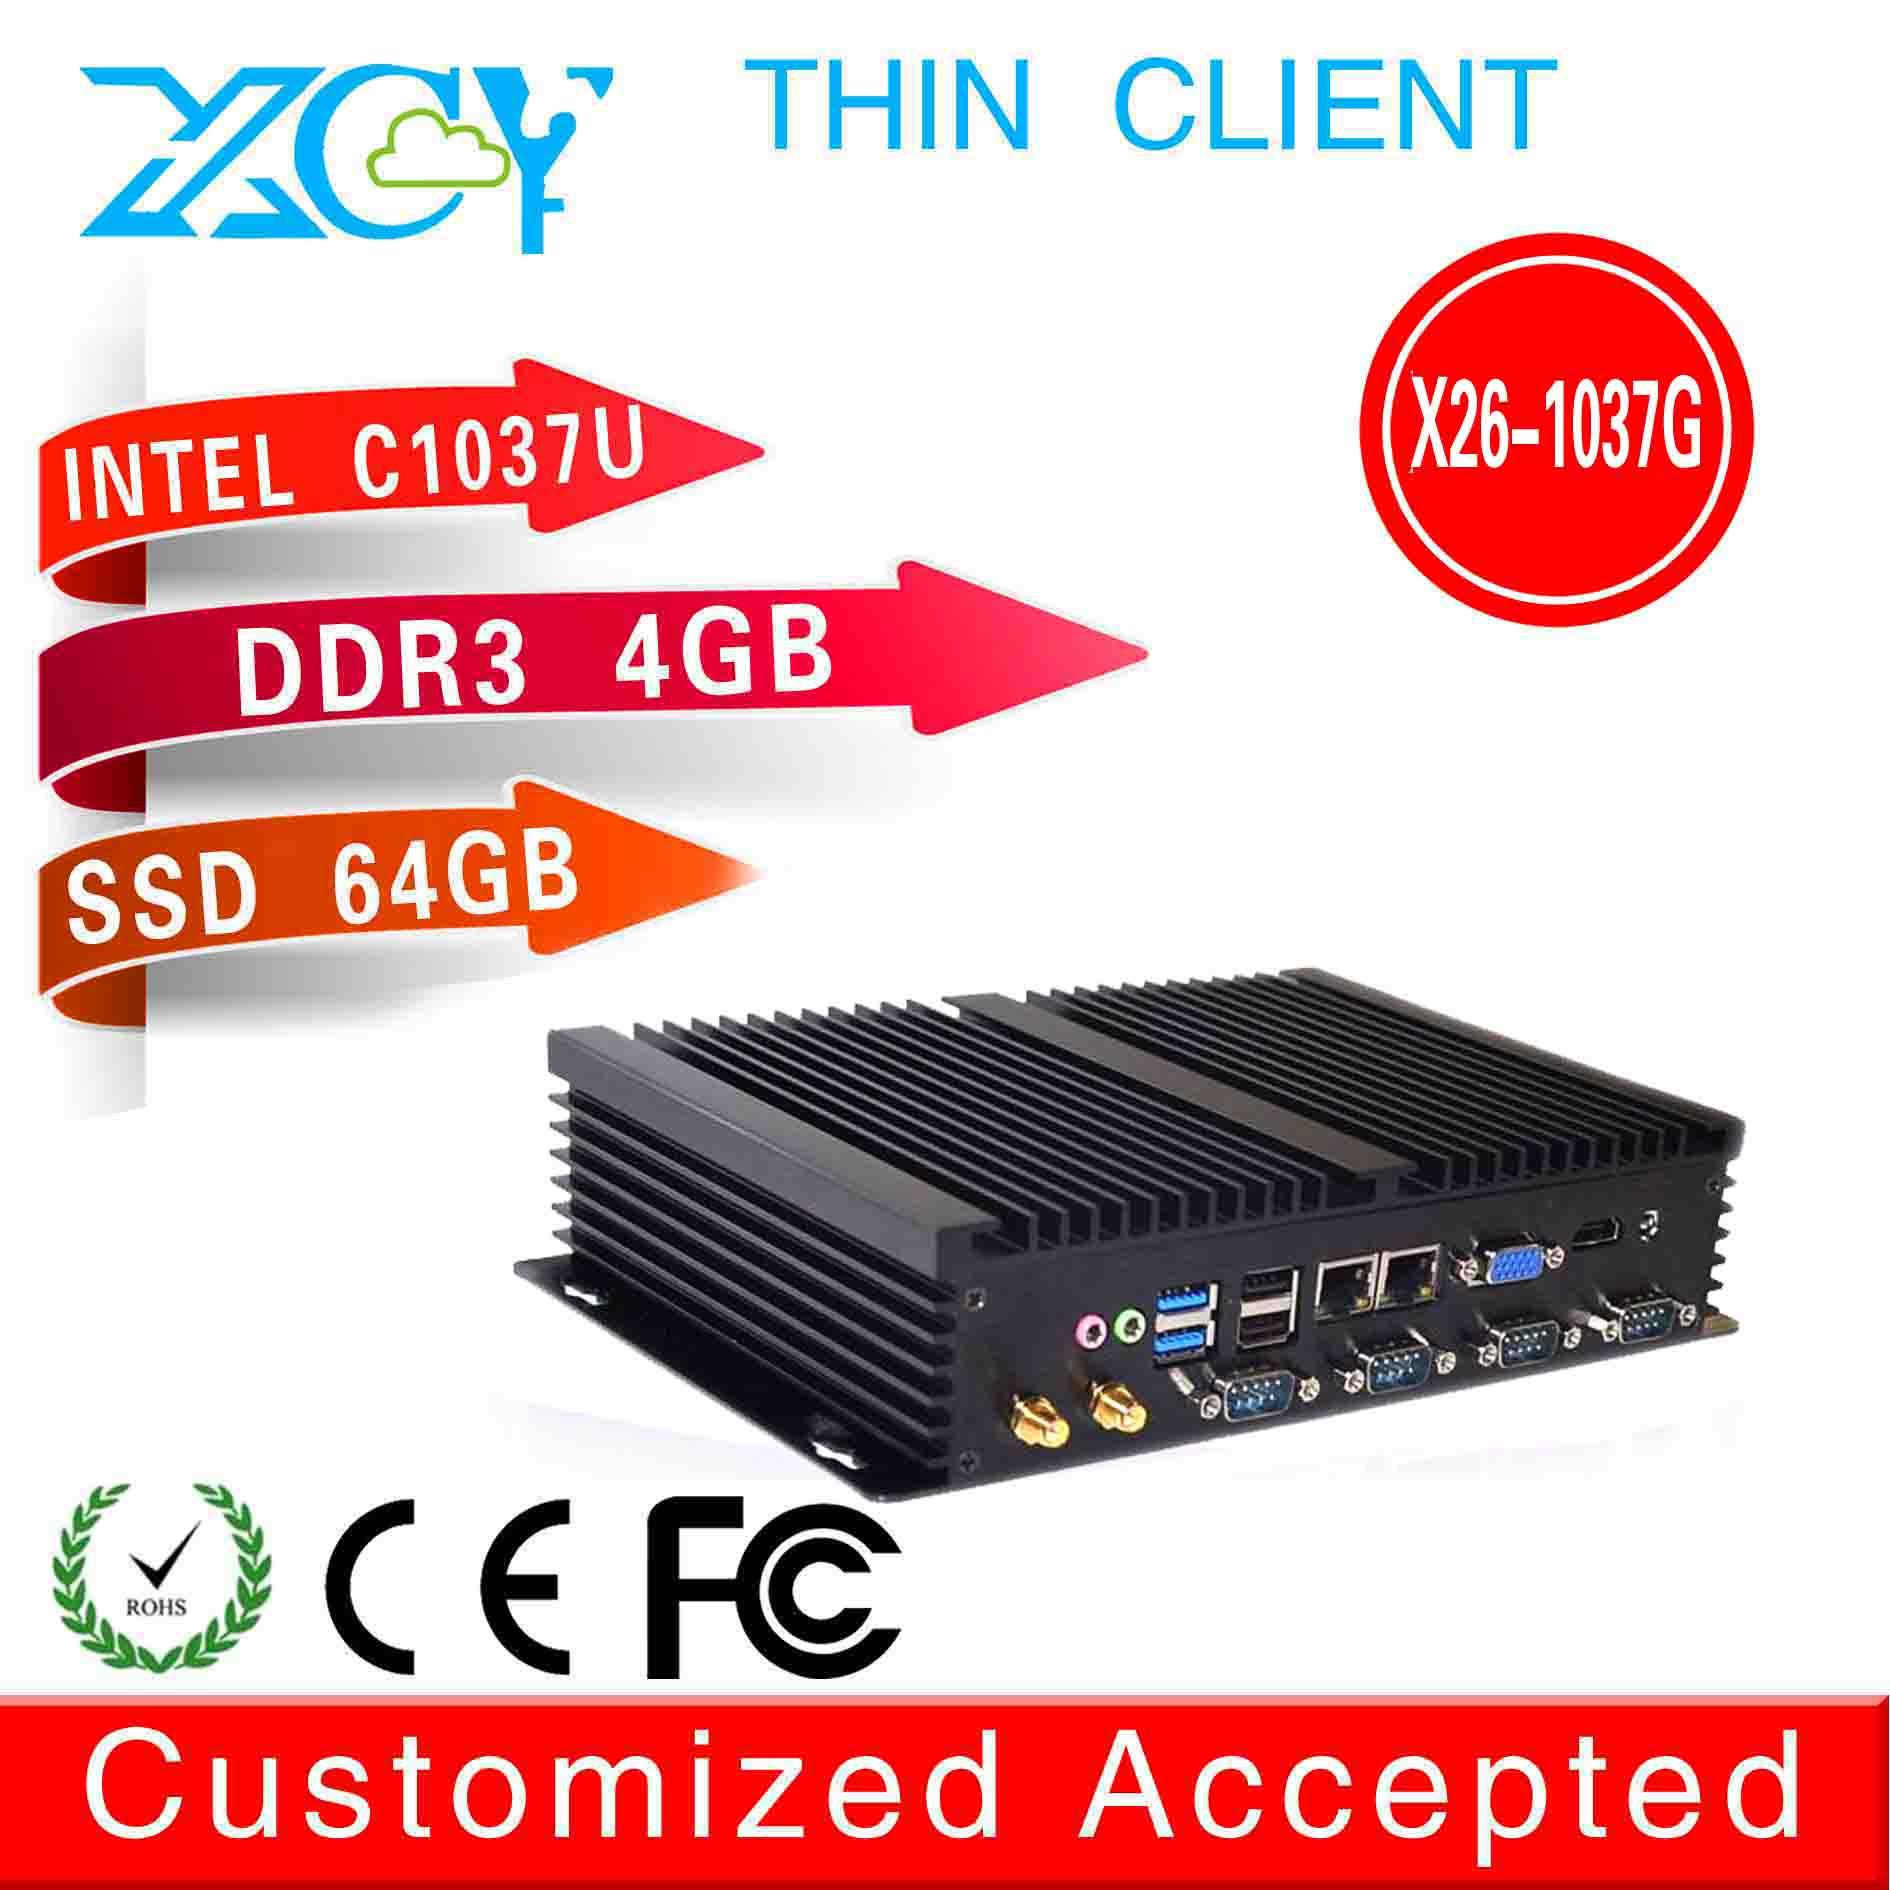 1080P Slim desktop oc 1037u network x26-1037G 2 lan fanless desktop thin client 4g ram 64g ssd support wireless mouse keyboard(China (Mainland))